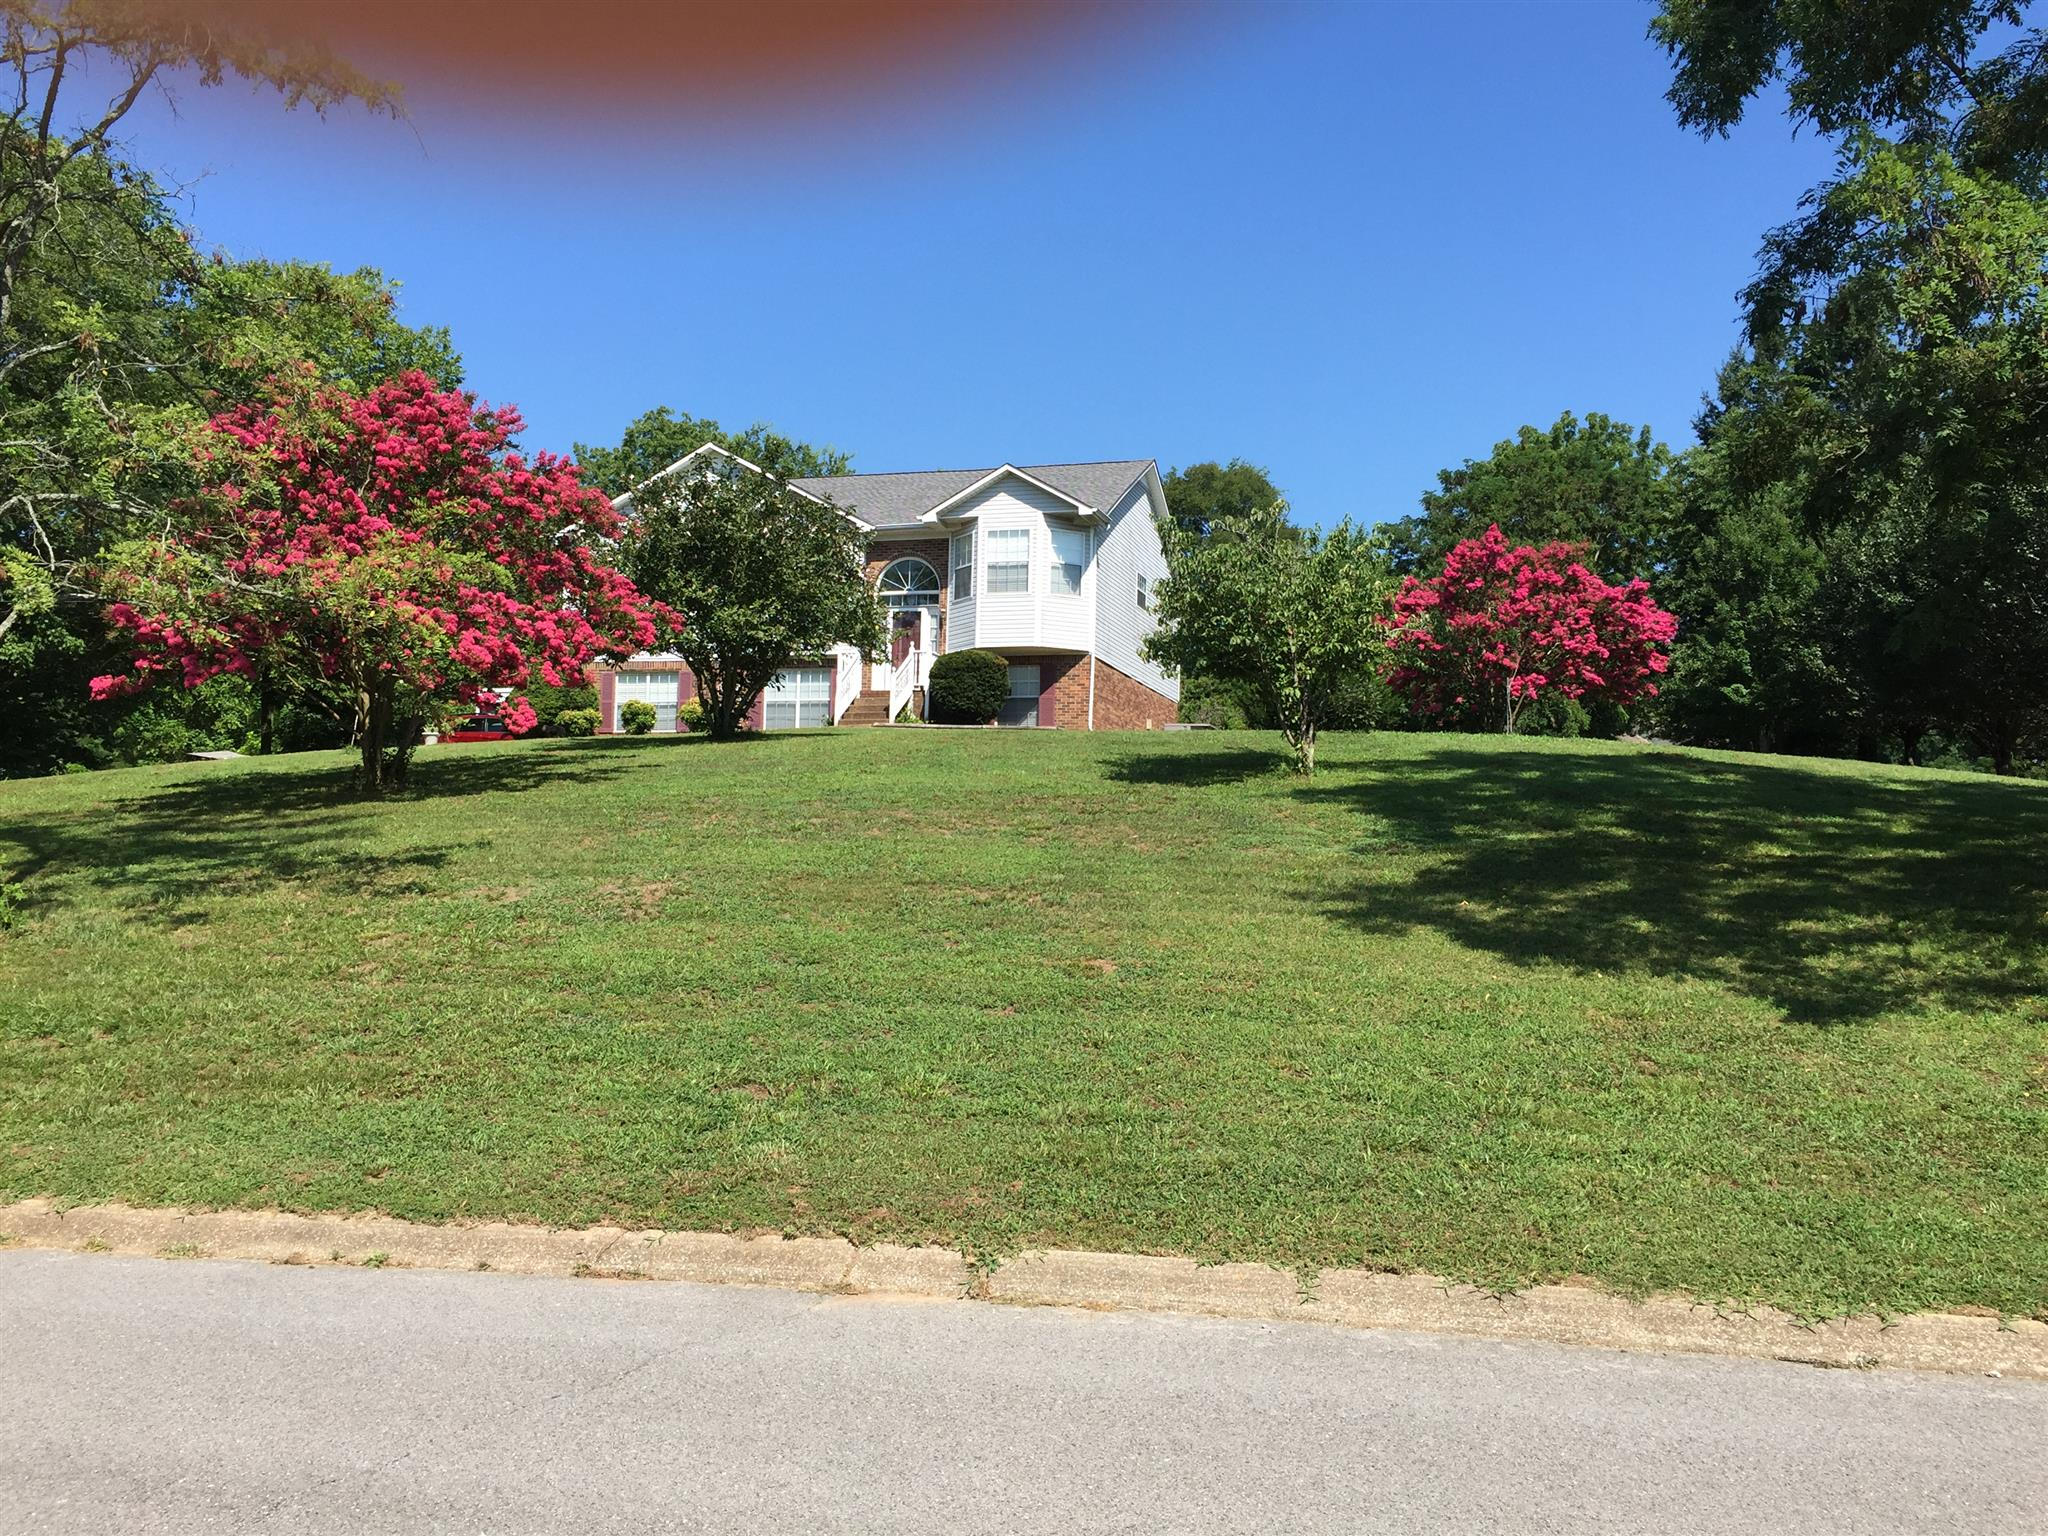 2024 Powell Dr, Culleoka, TN 38451 - Culleoka, TN real estate listing